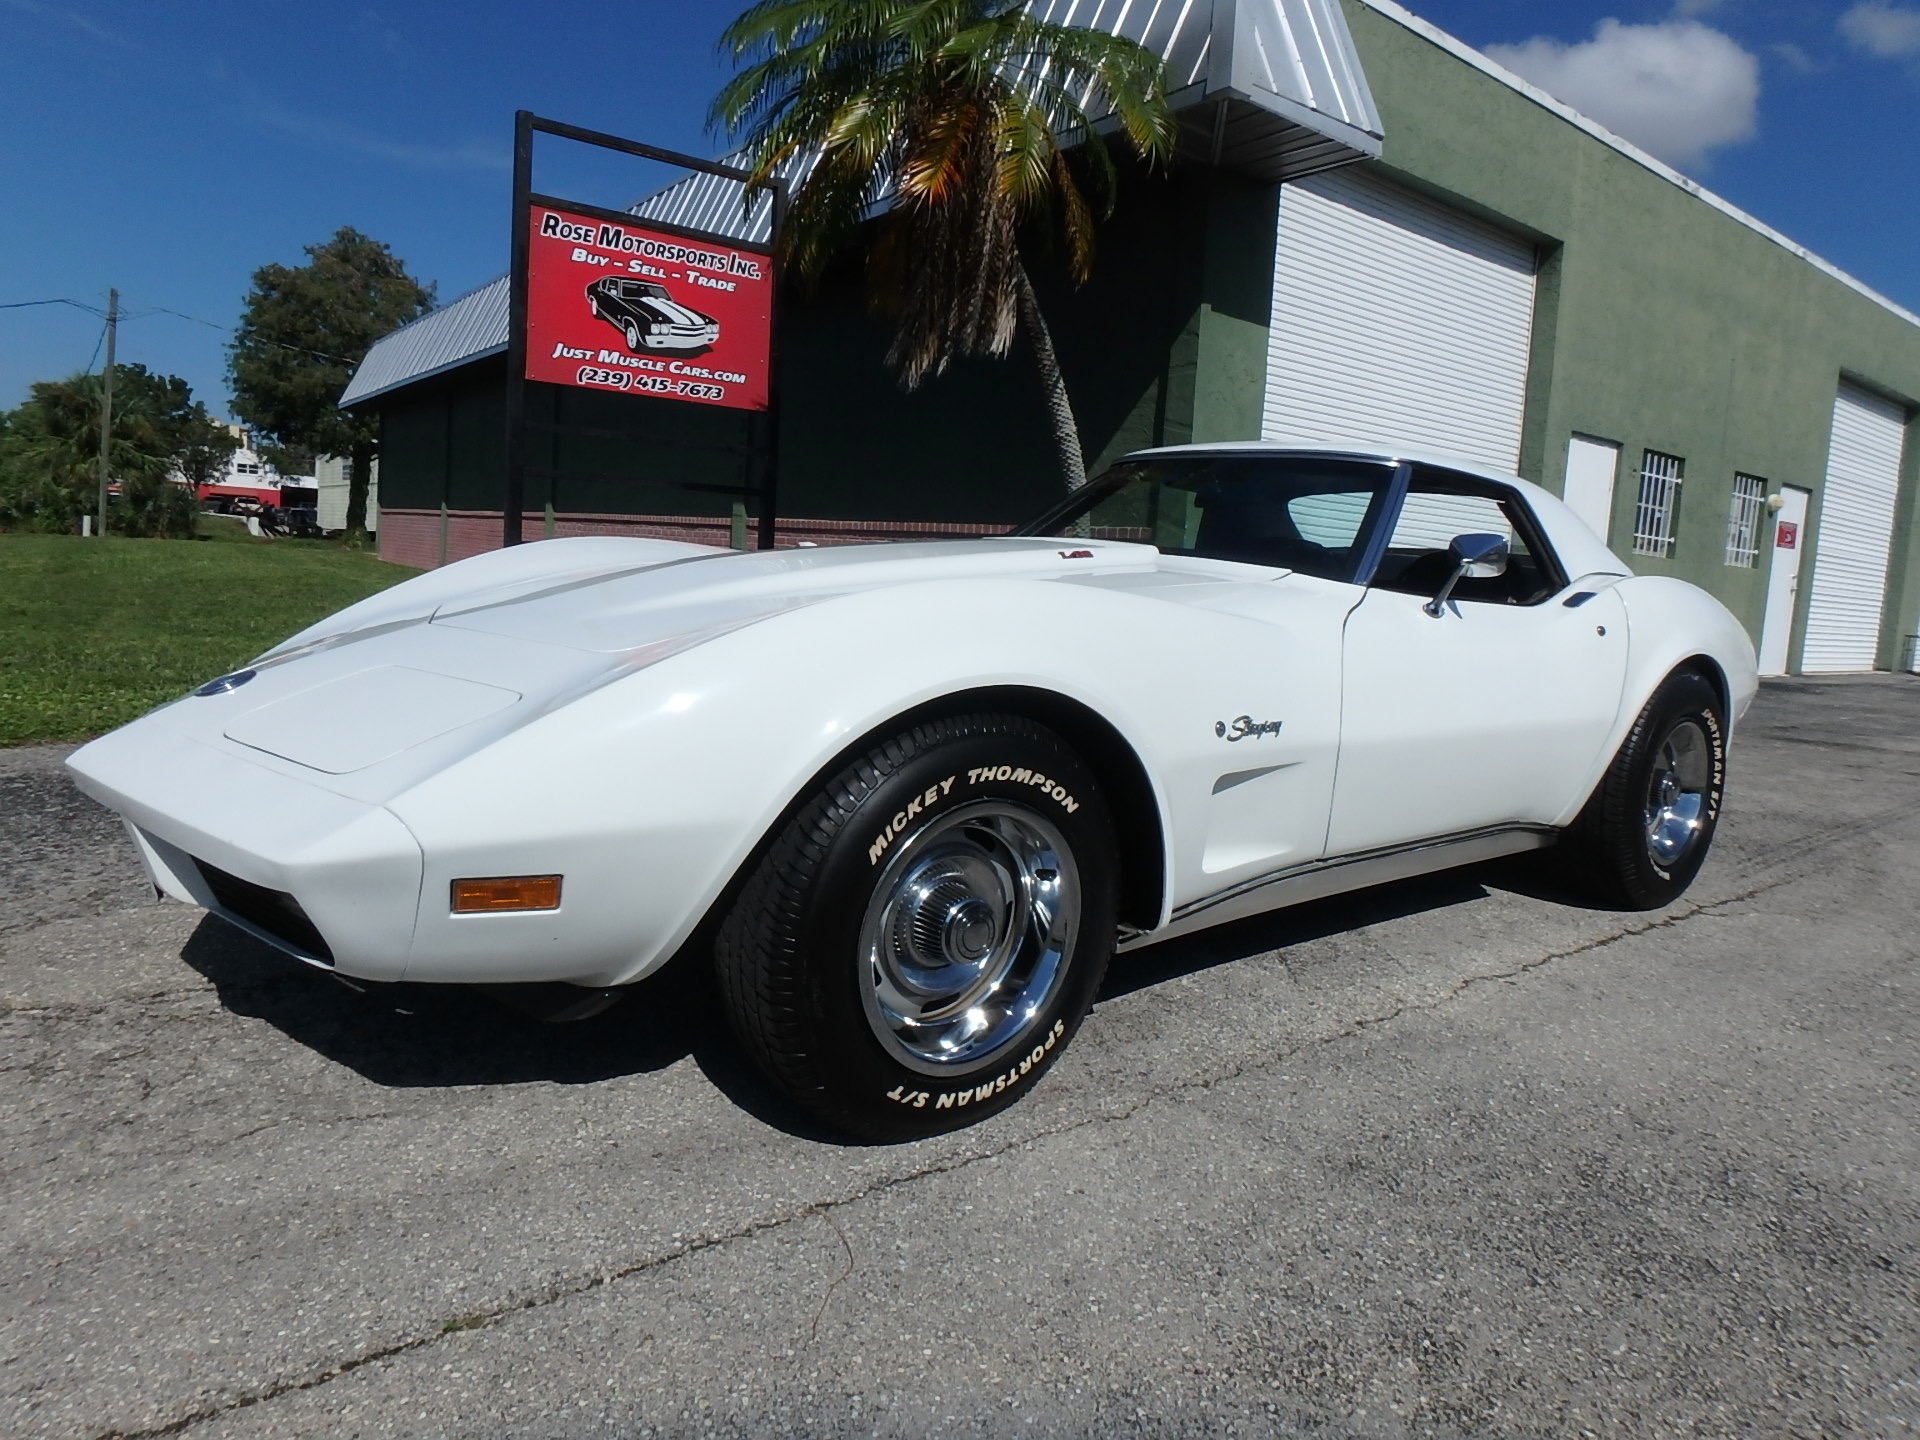 Used 1974 Chevy Corvette Convertible